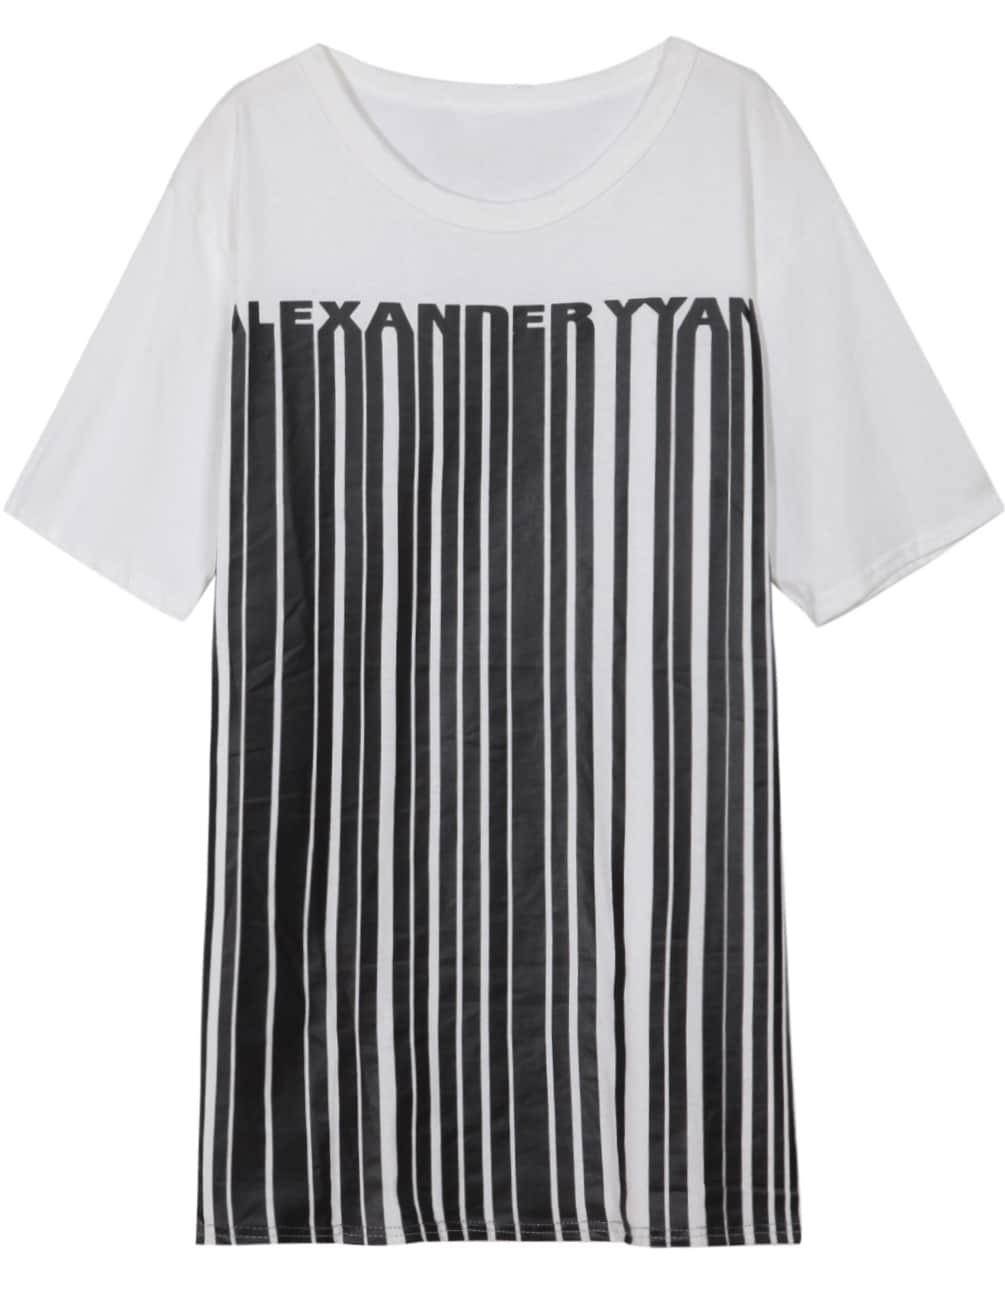 White Round Neck Vertical Striped Loose T-Shirt -SheIn ...